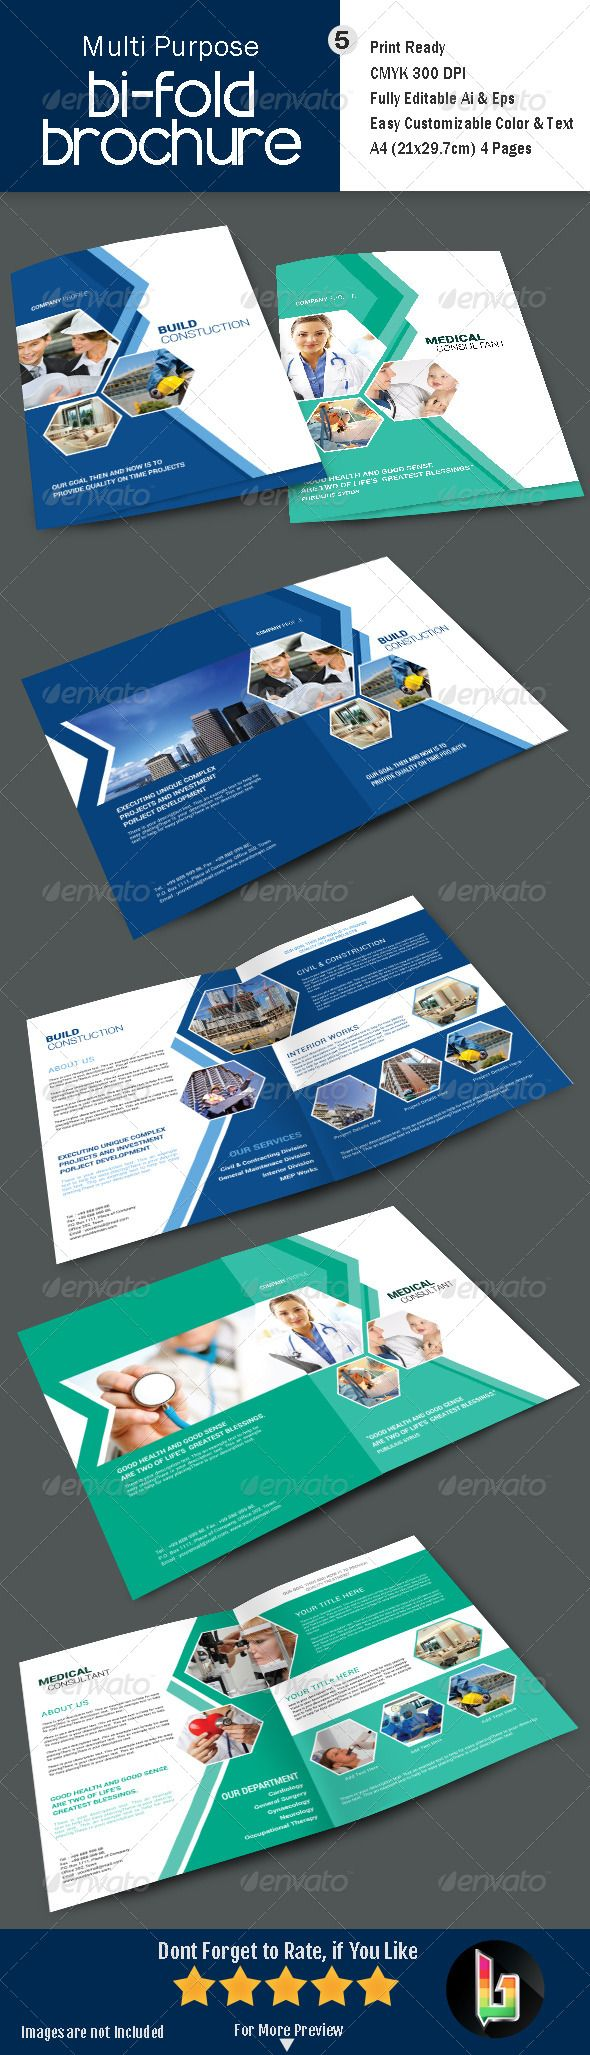 Multi Purpose Bi-Fold Brochre - V5